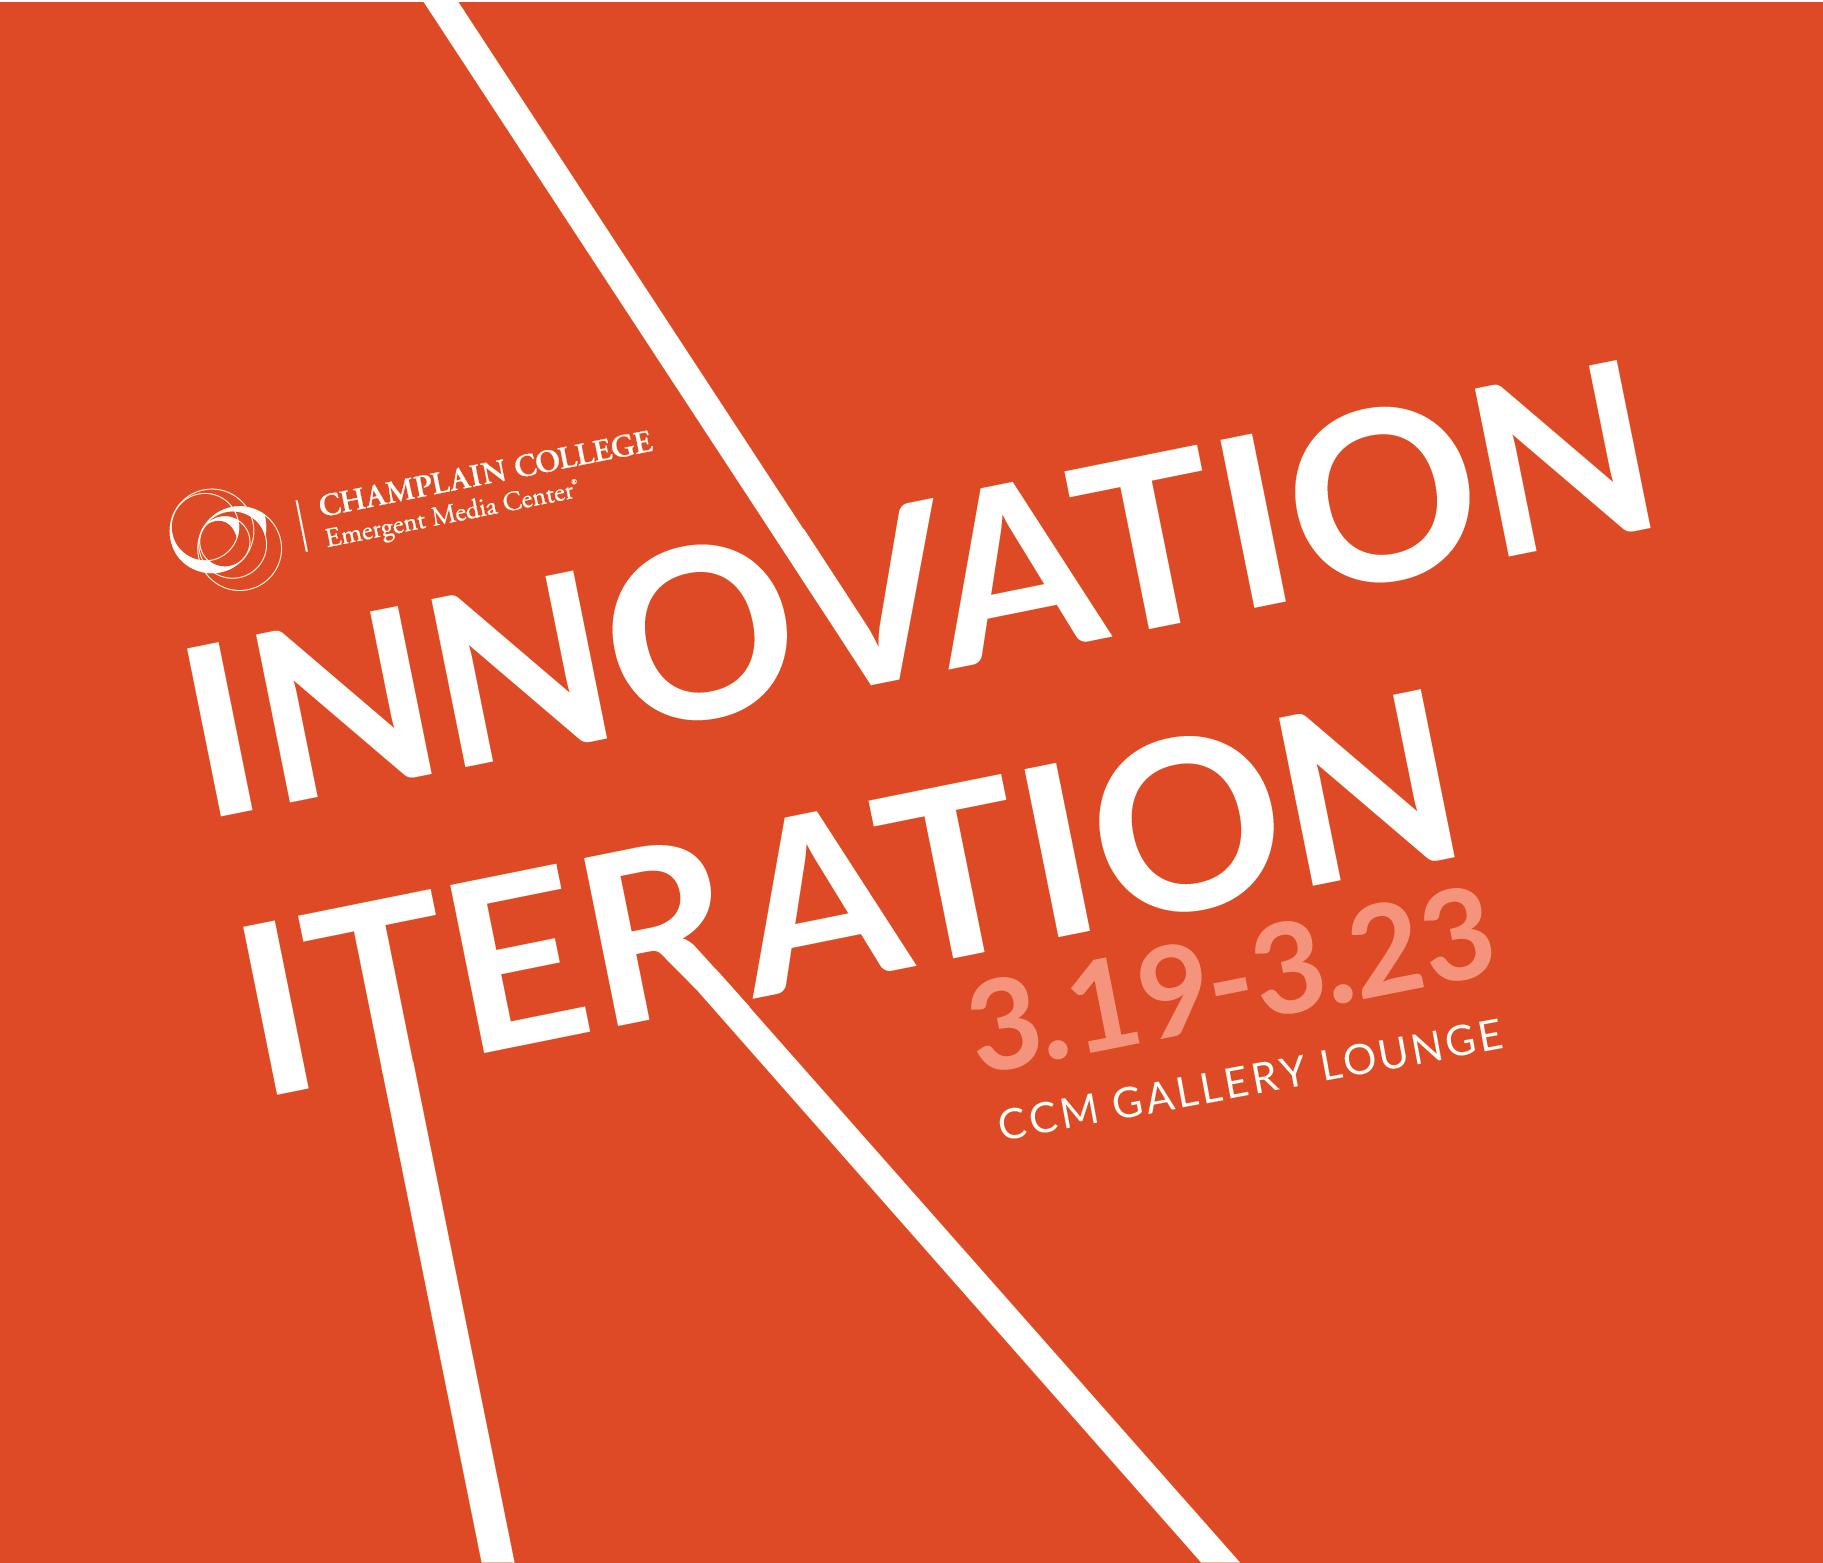 Innovation Iteration: An EMC Exhibit